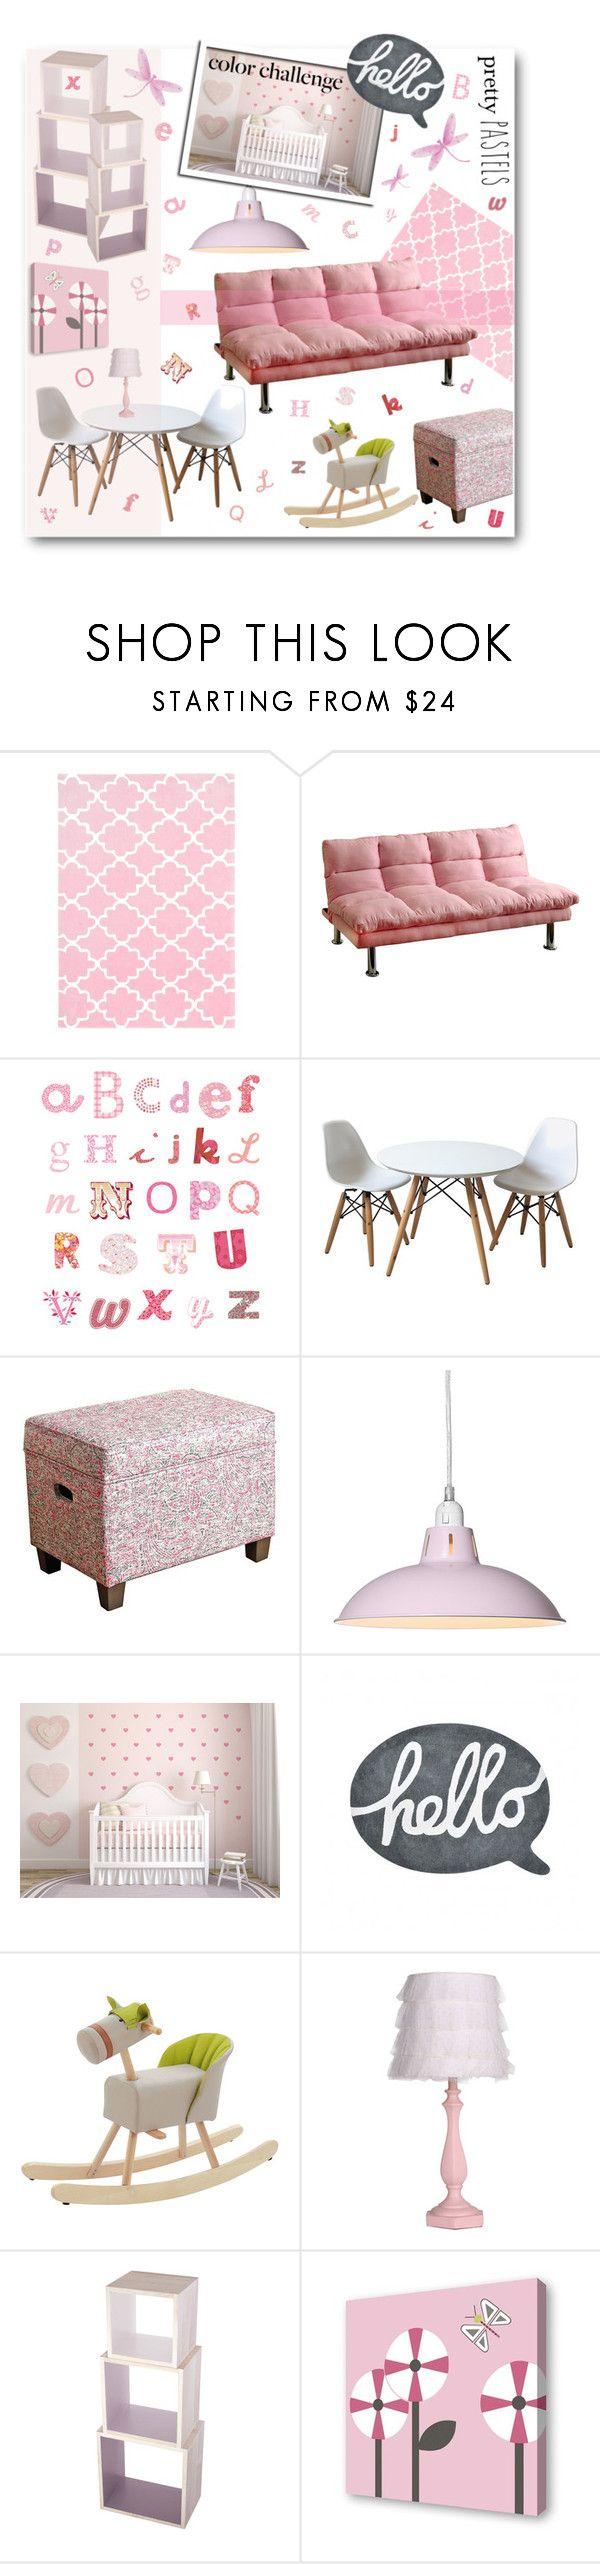 """Color Challenge: Pretty Pastels"" by anitadz ❤ liked on Polyvore featuring interior, interiors, interior design, home, home decor, interior decorating, Unitex International, Lilipinso, Dot & Bo and Sebra"